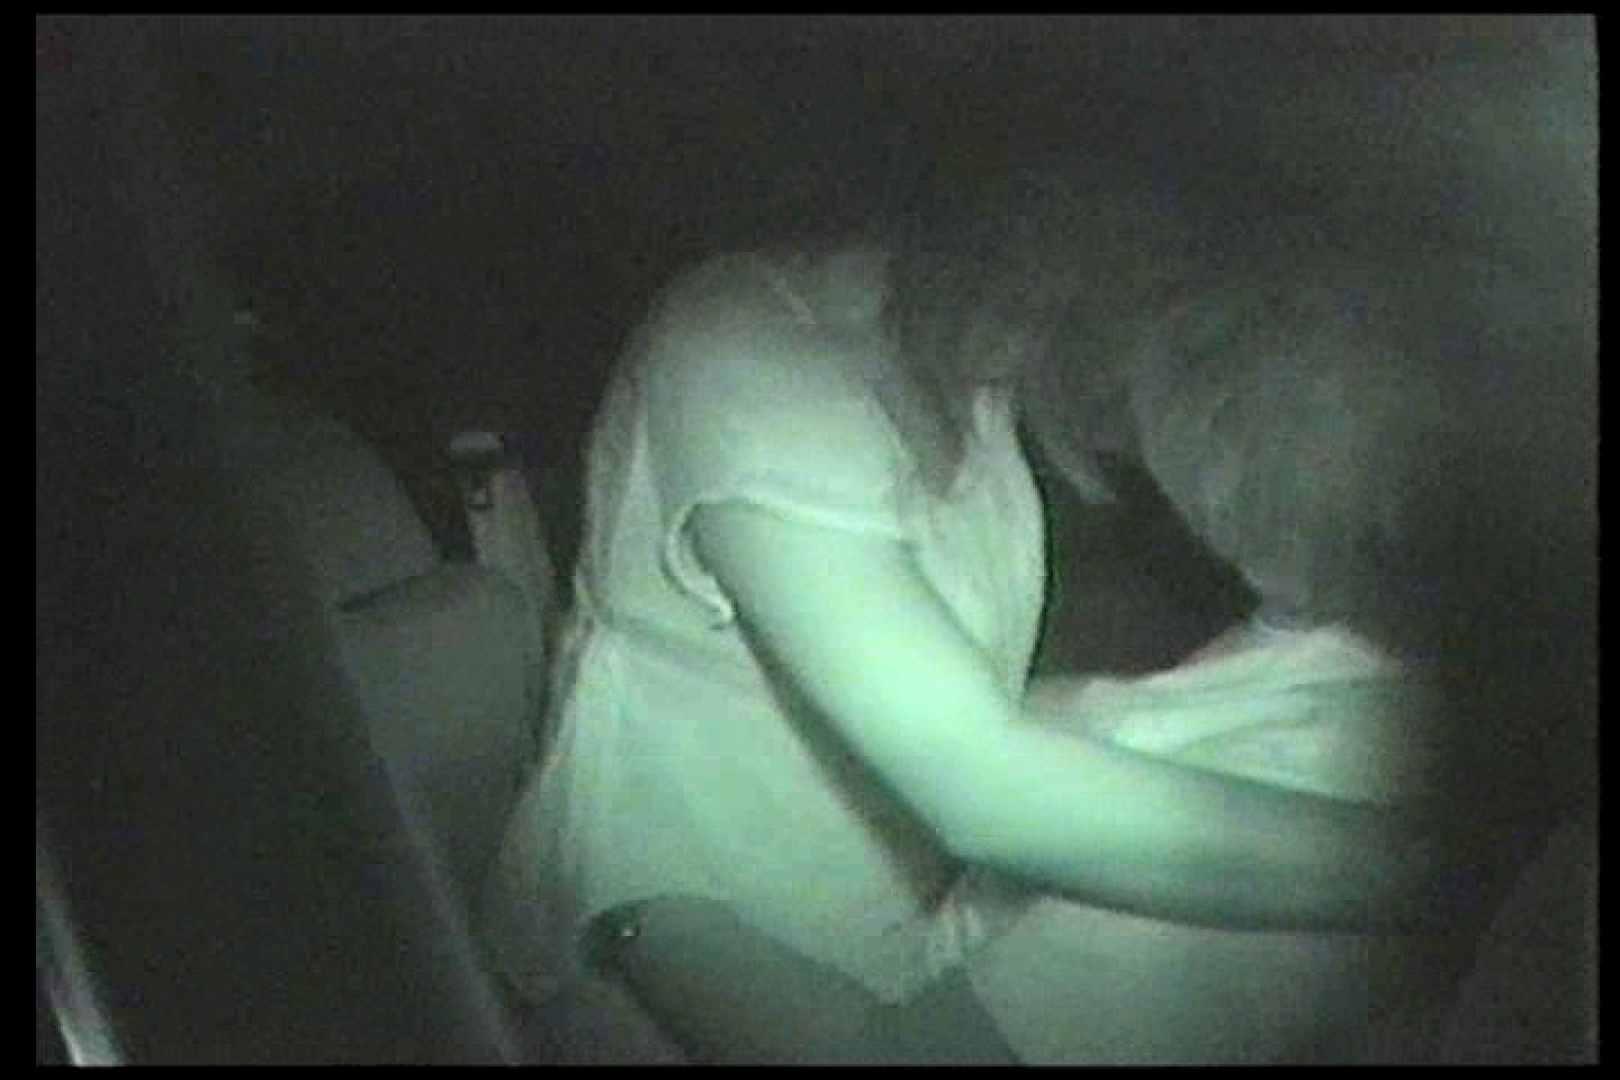 カーセックス未編集・無修正版 Vol.6後編 美女OL 濡れ場動画紹介 76連発 2